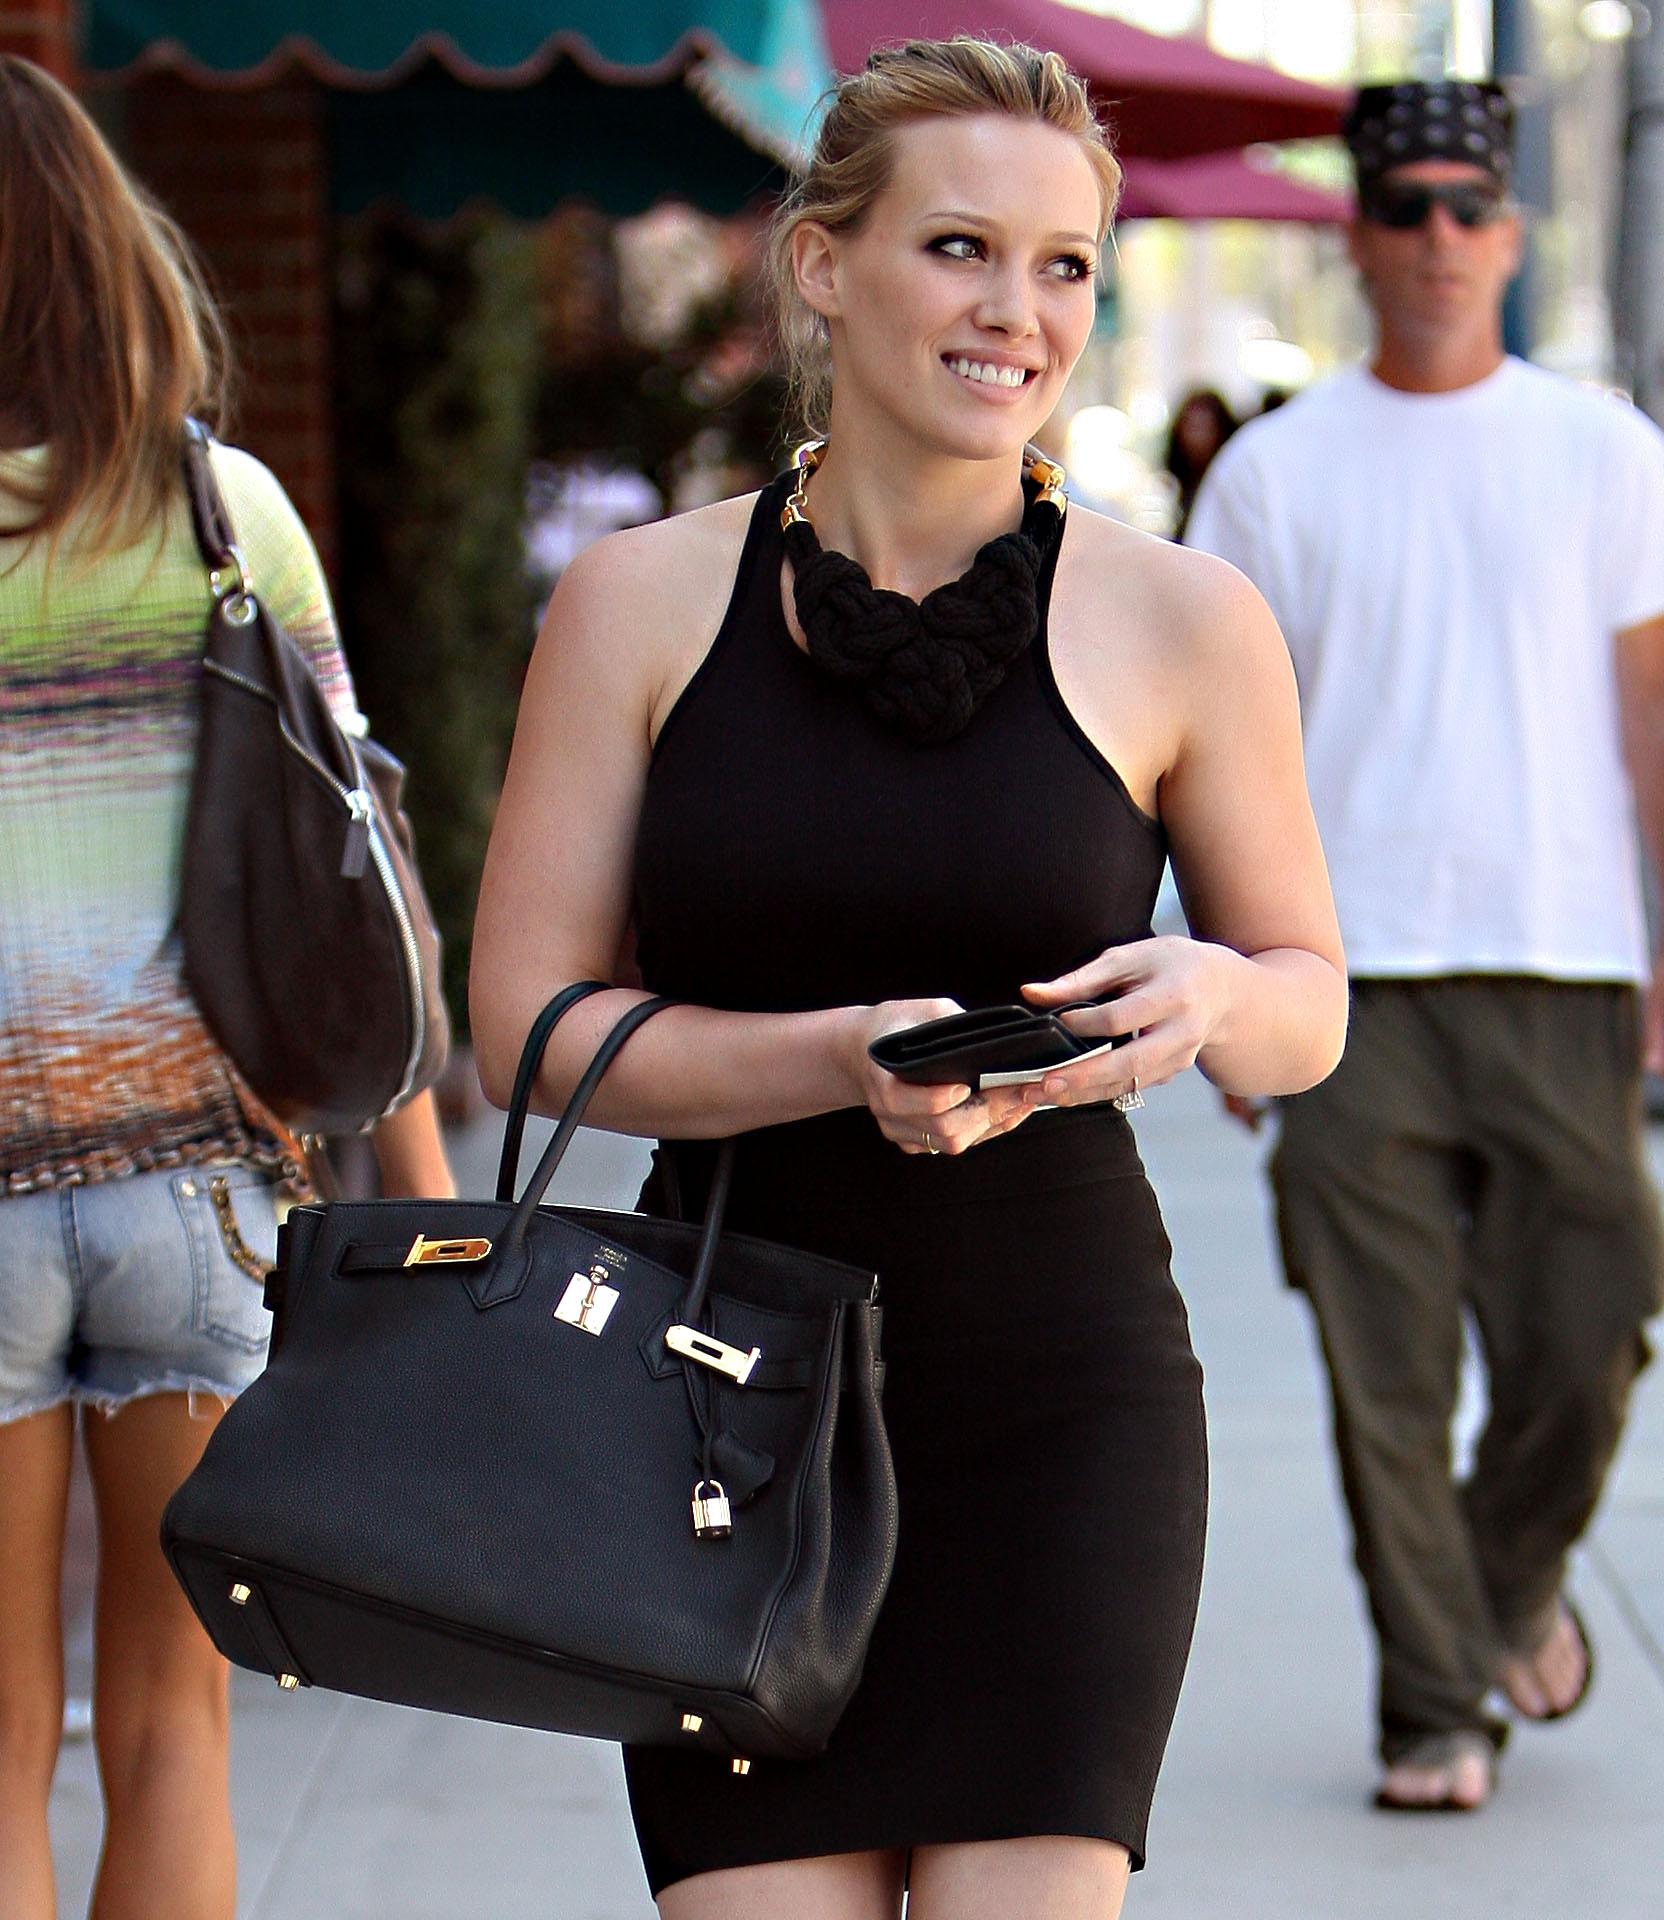 85135_Hilary_Duff_Gucci_Beverly_Hills13_122_588lo.jpg